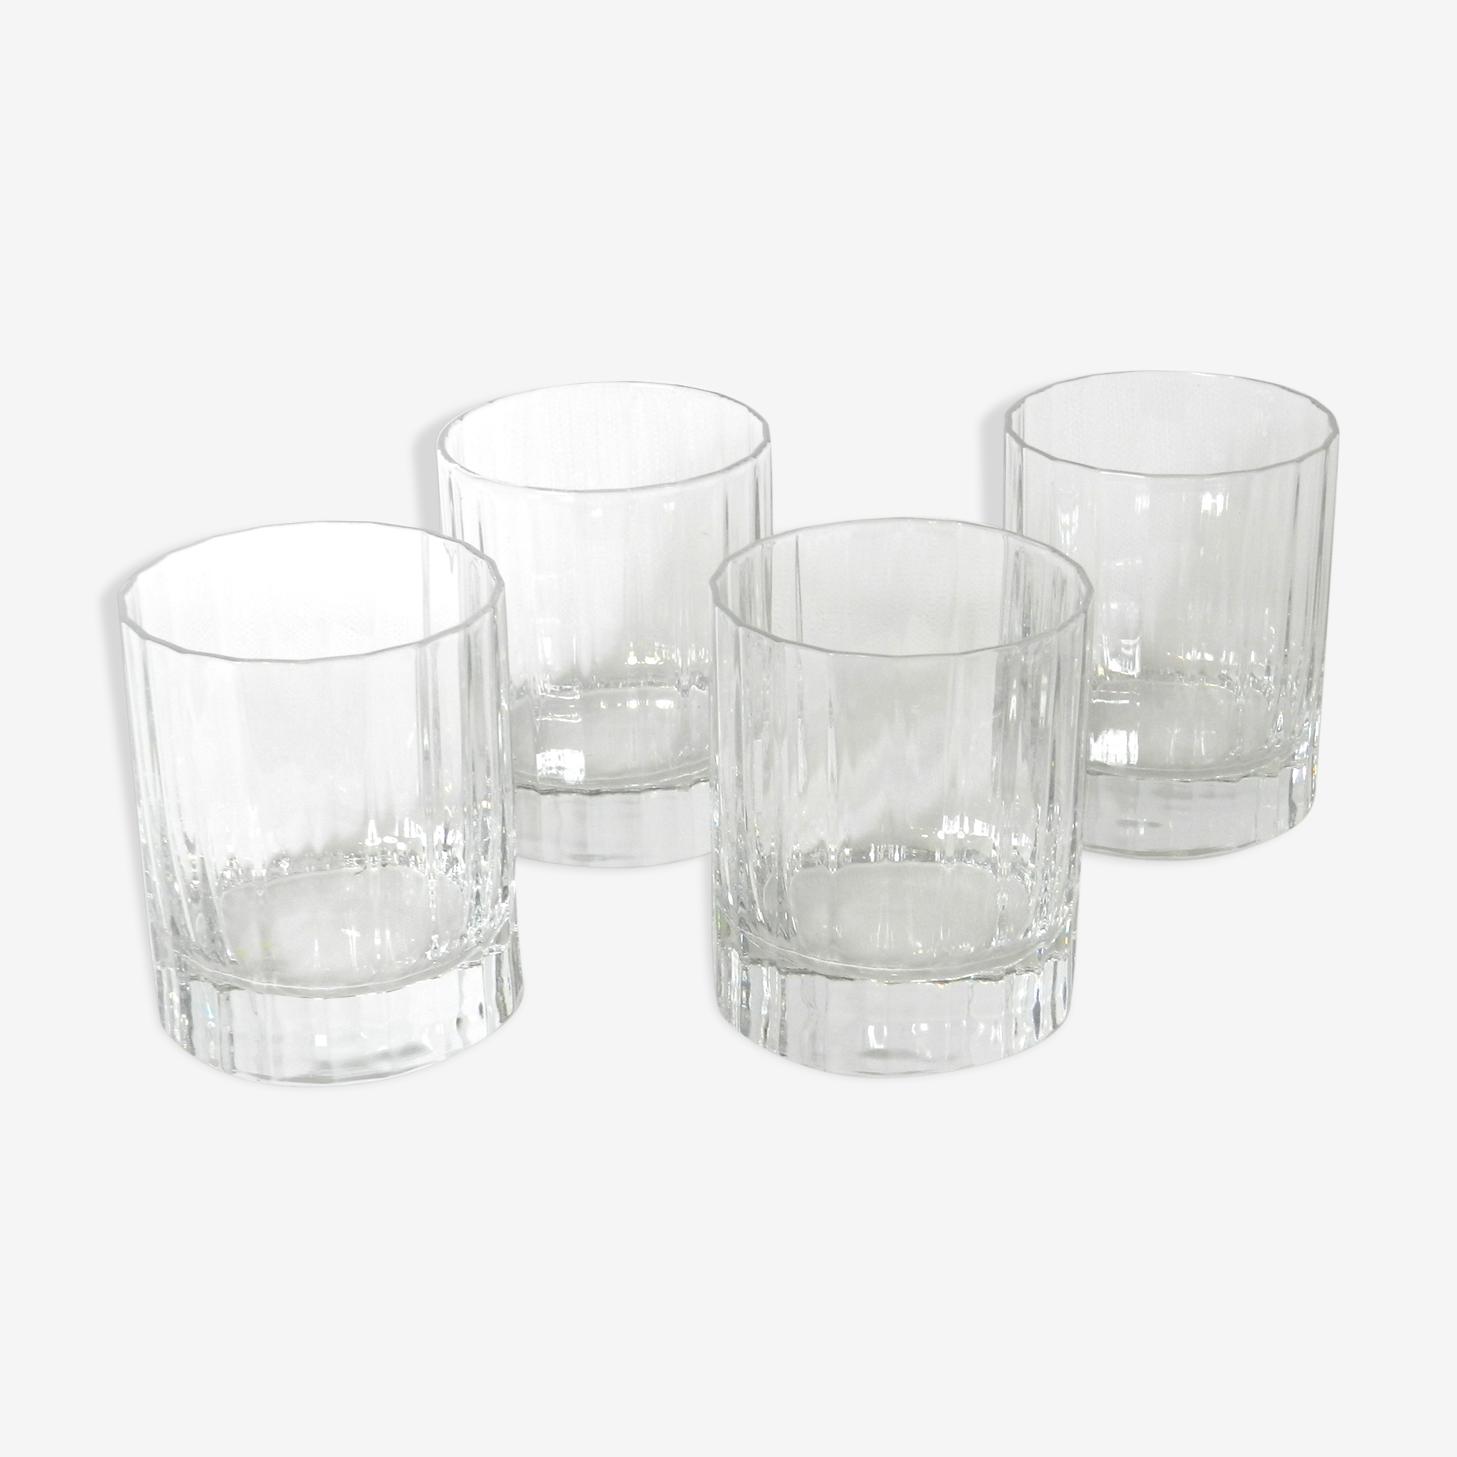 4 crystal whisky glasses